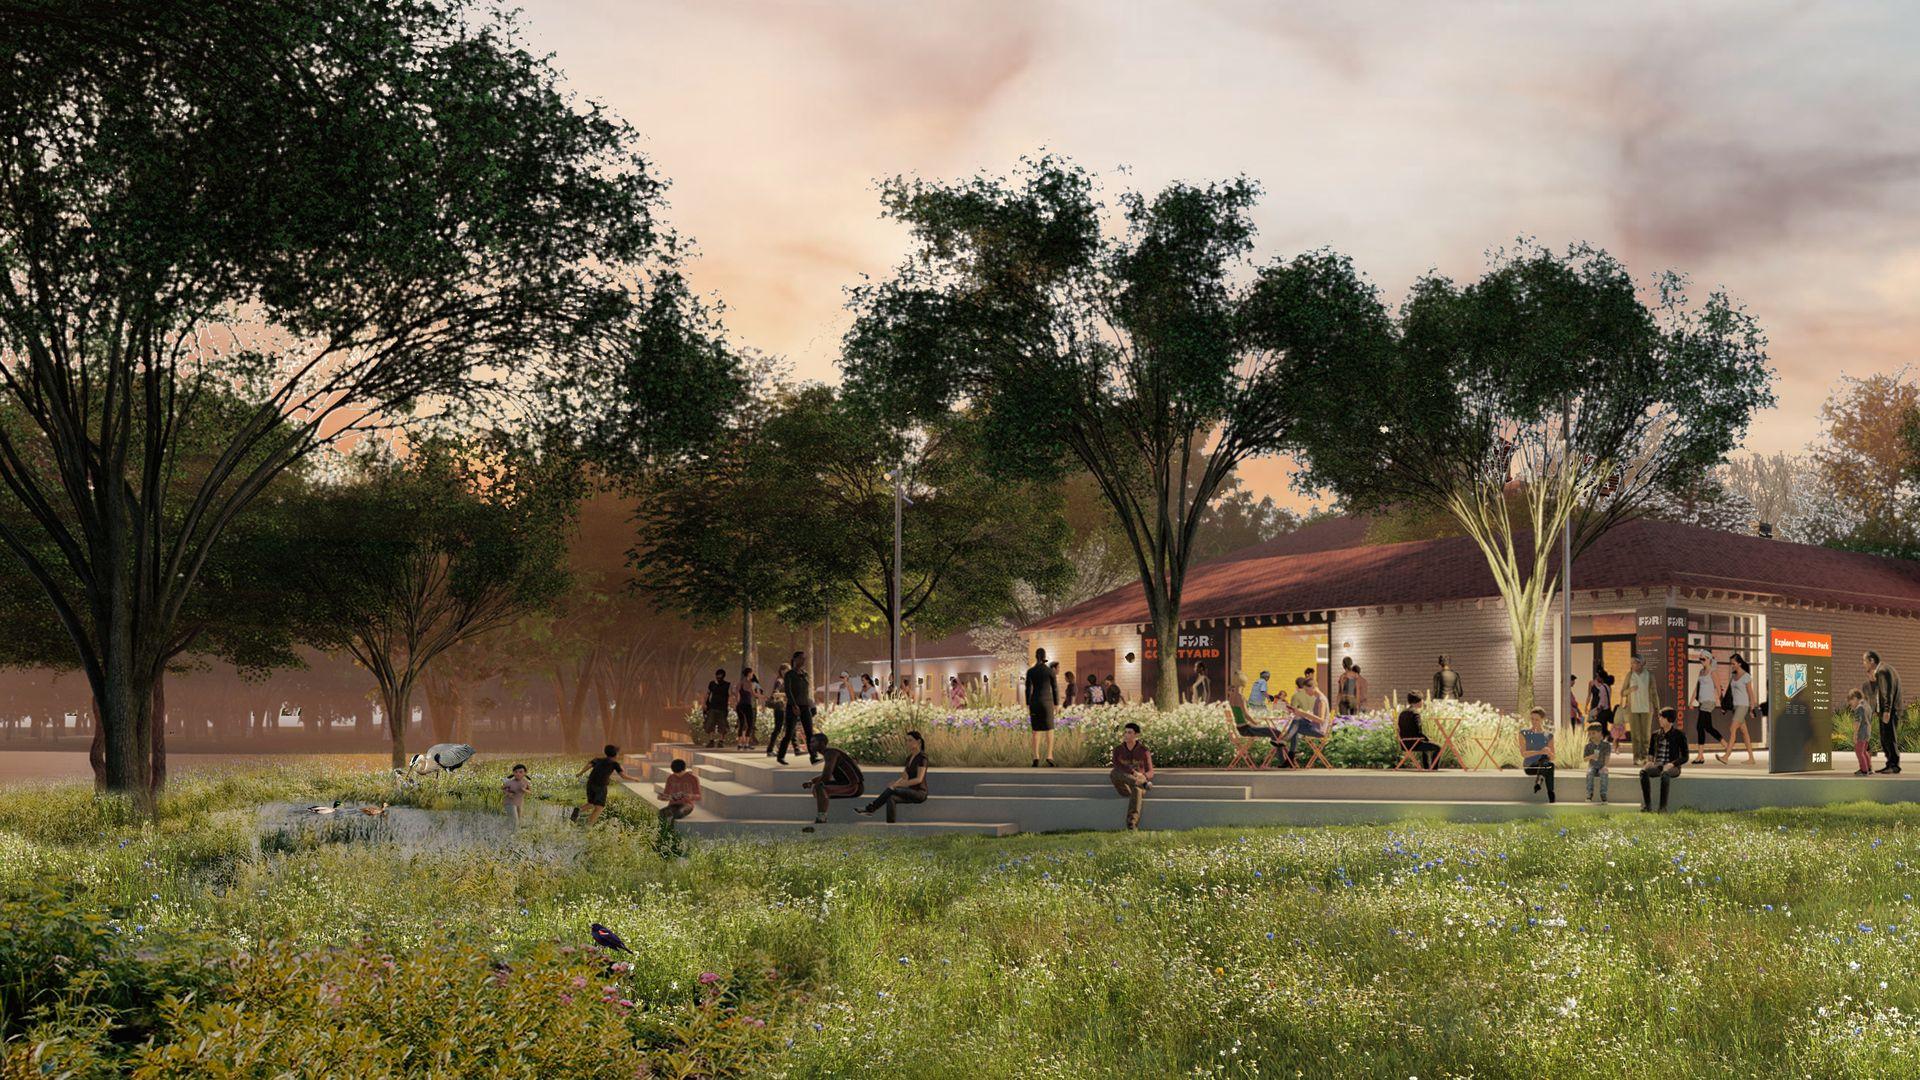 Renderings of FDR park upgrades